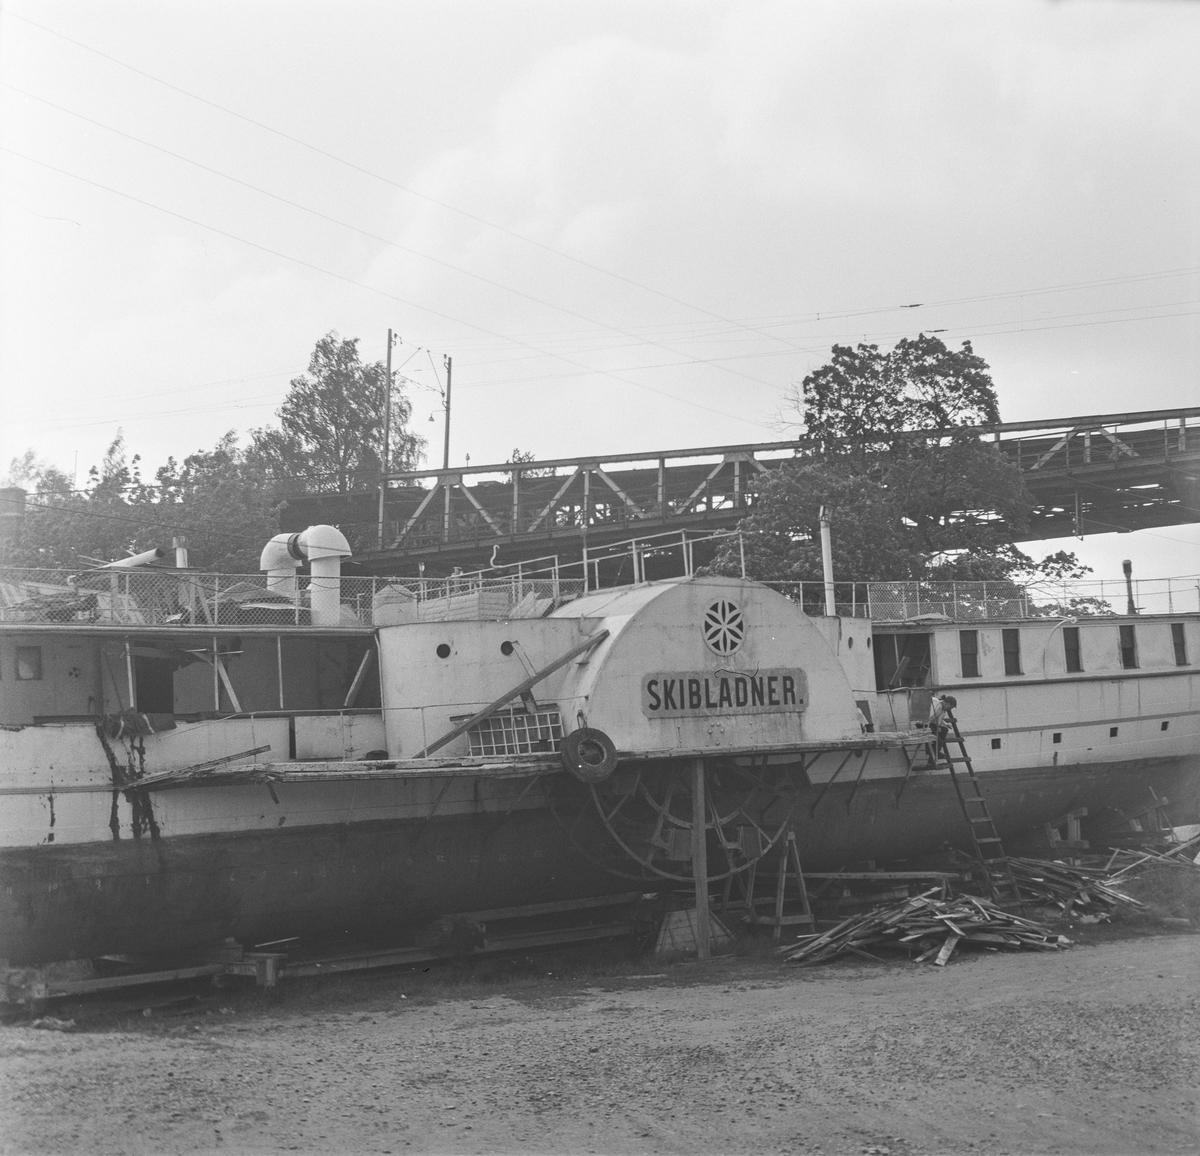 D/S Skiblander slippsatt på Minnesund